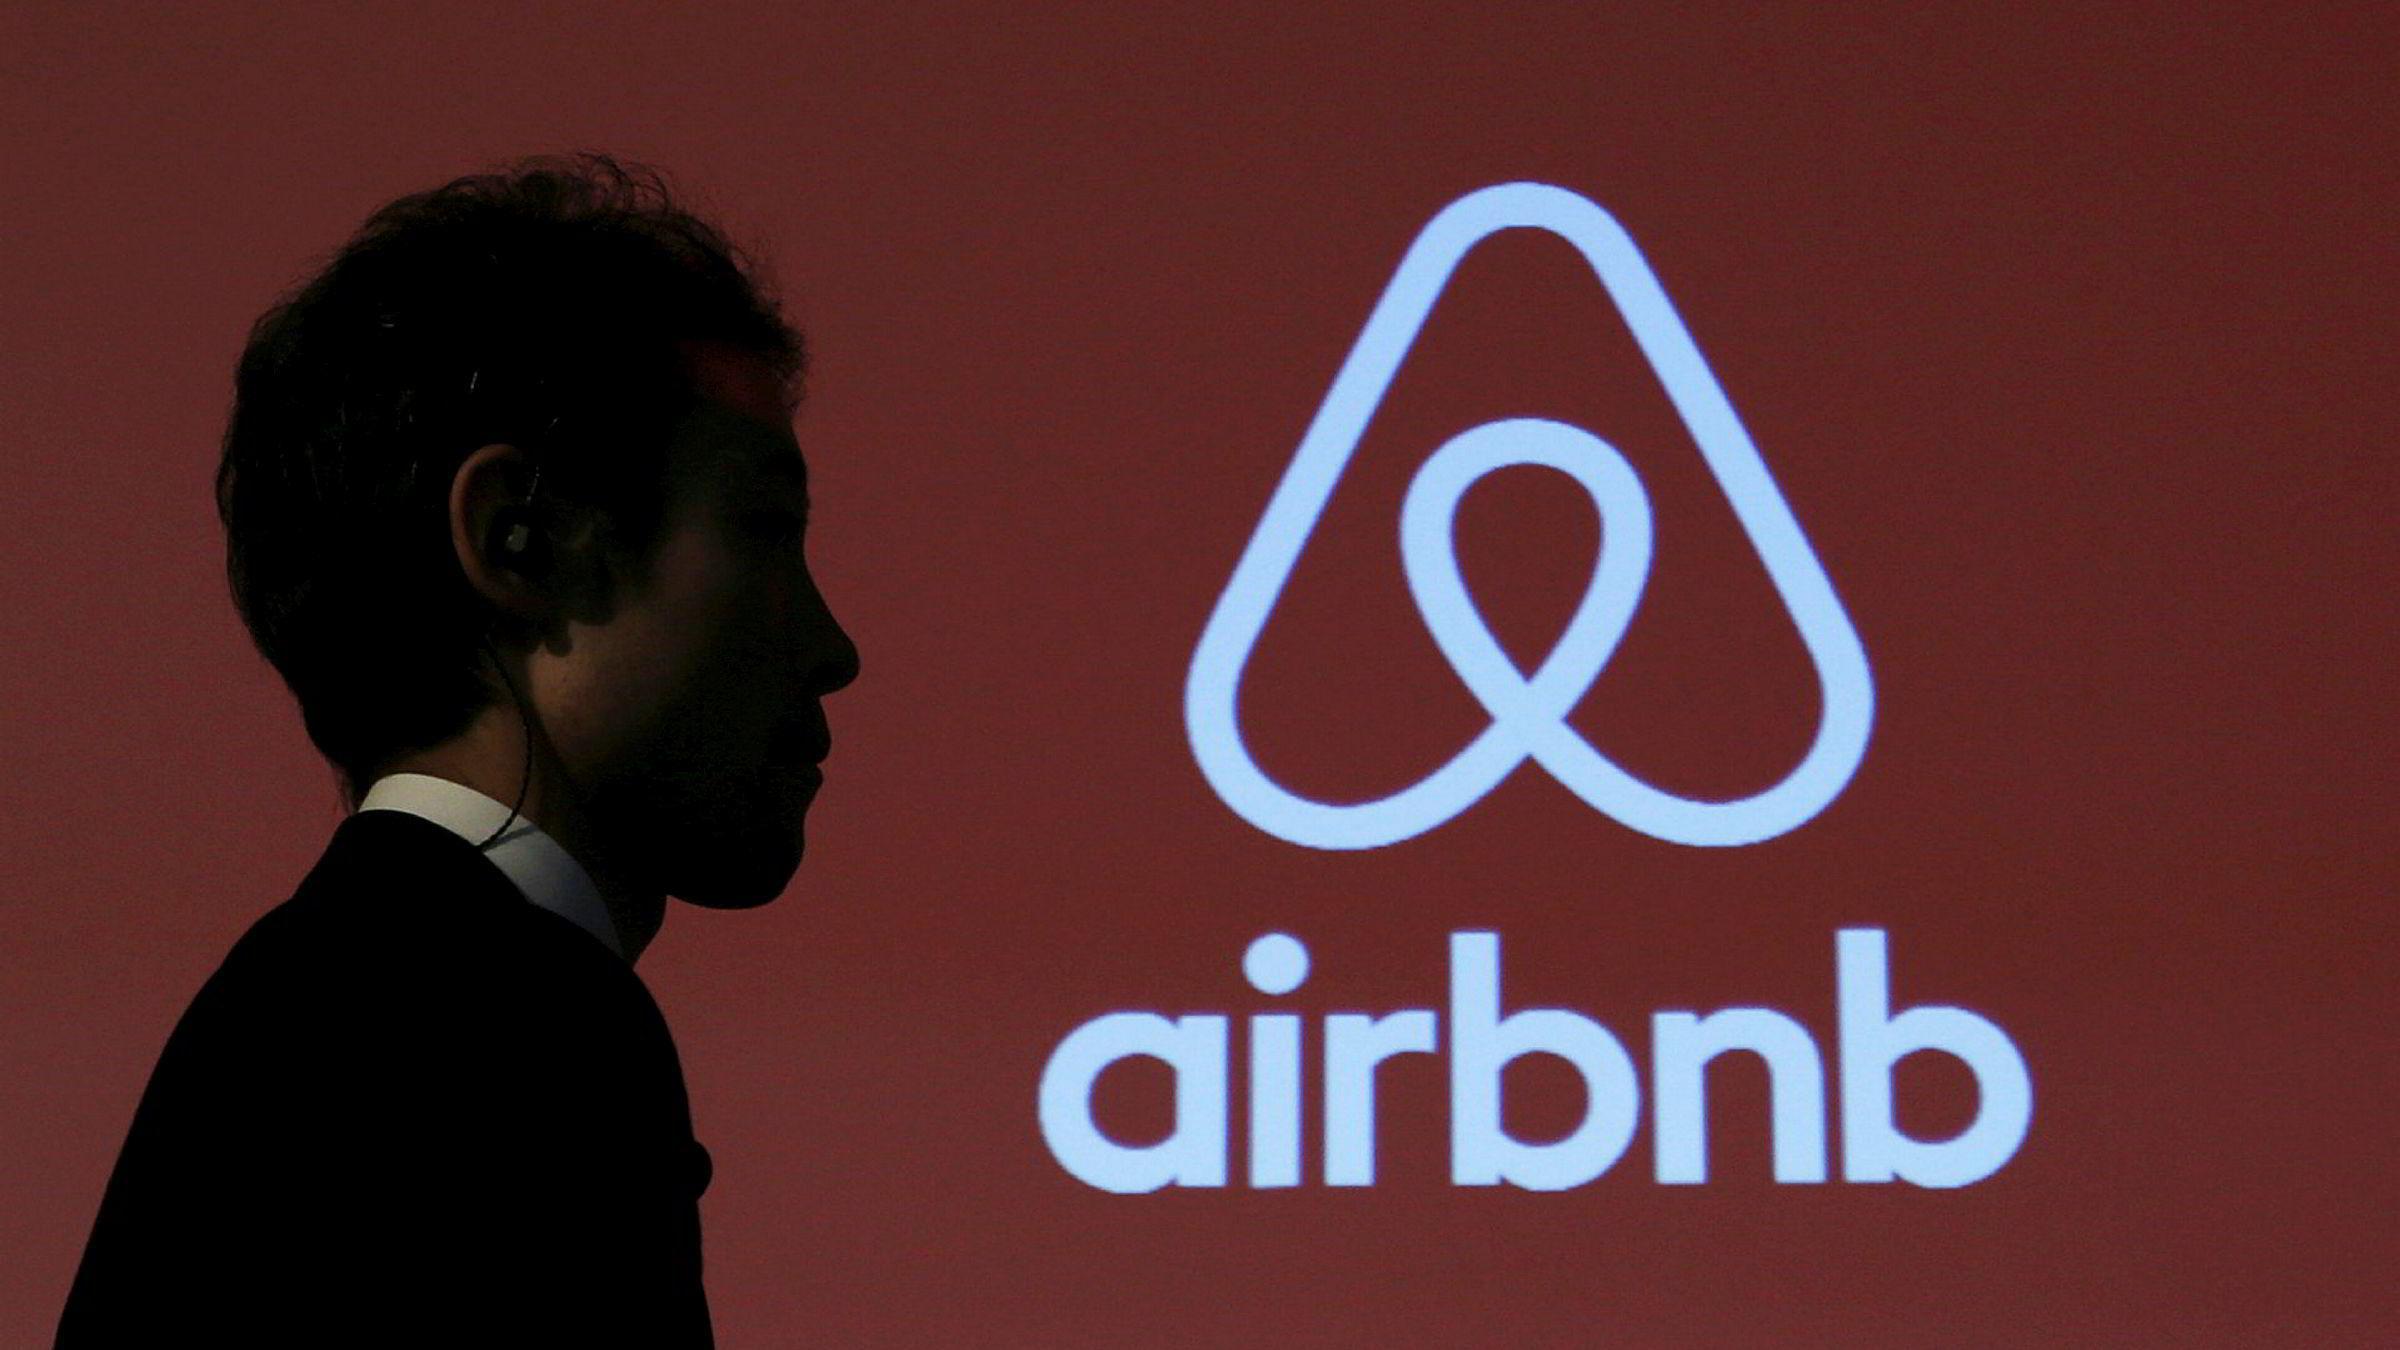 Airbnb utvider tilbudet, og vil også omfatte turer og aktiviteter.